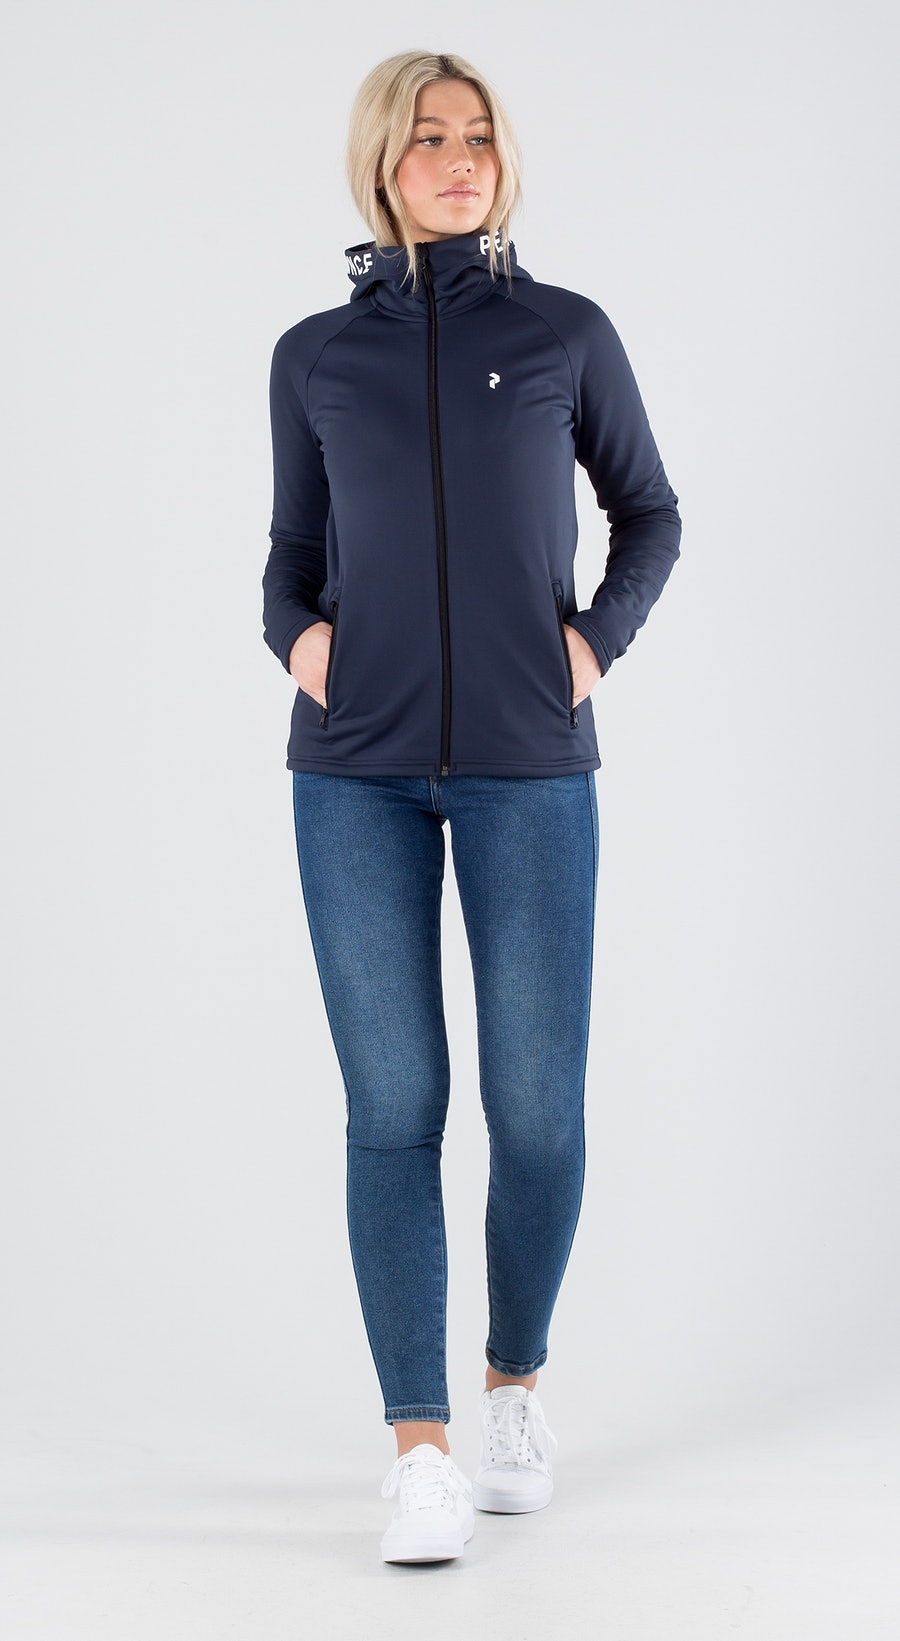 Peak Performance Rider Zip Blue Shadow Outfit Multi